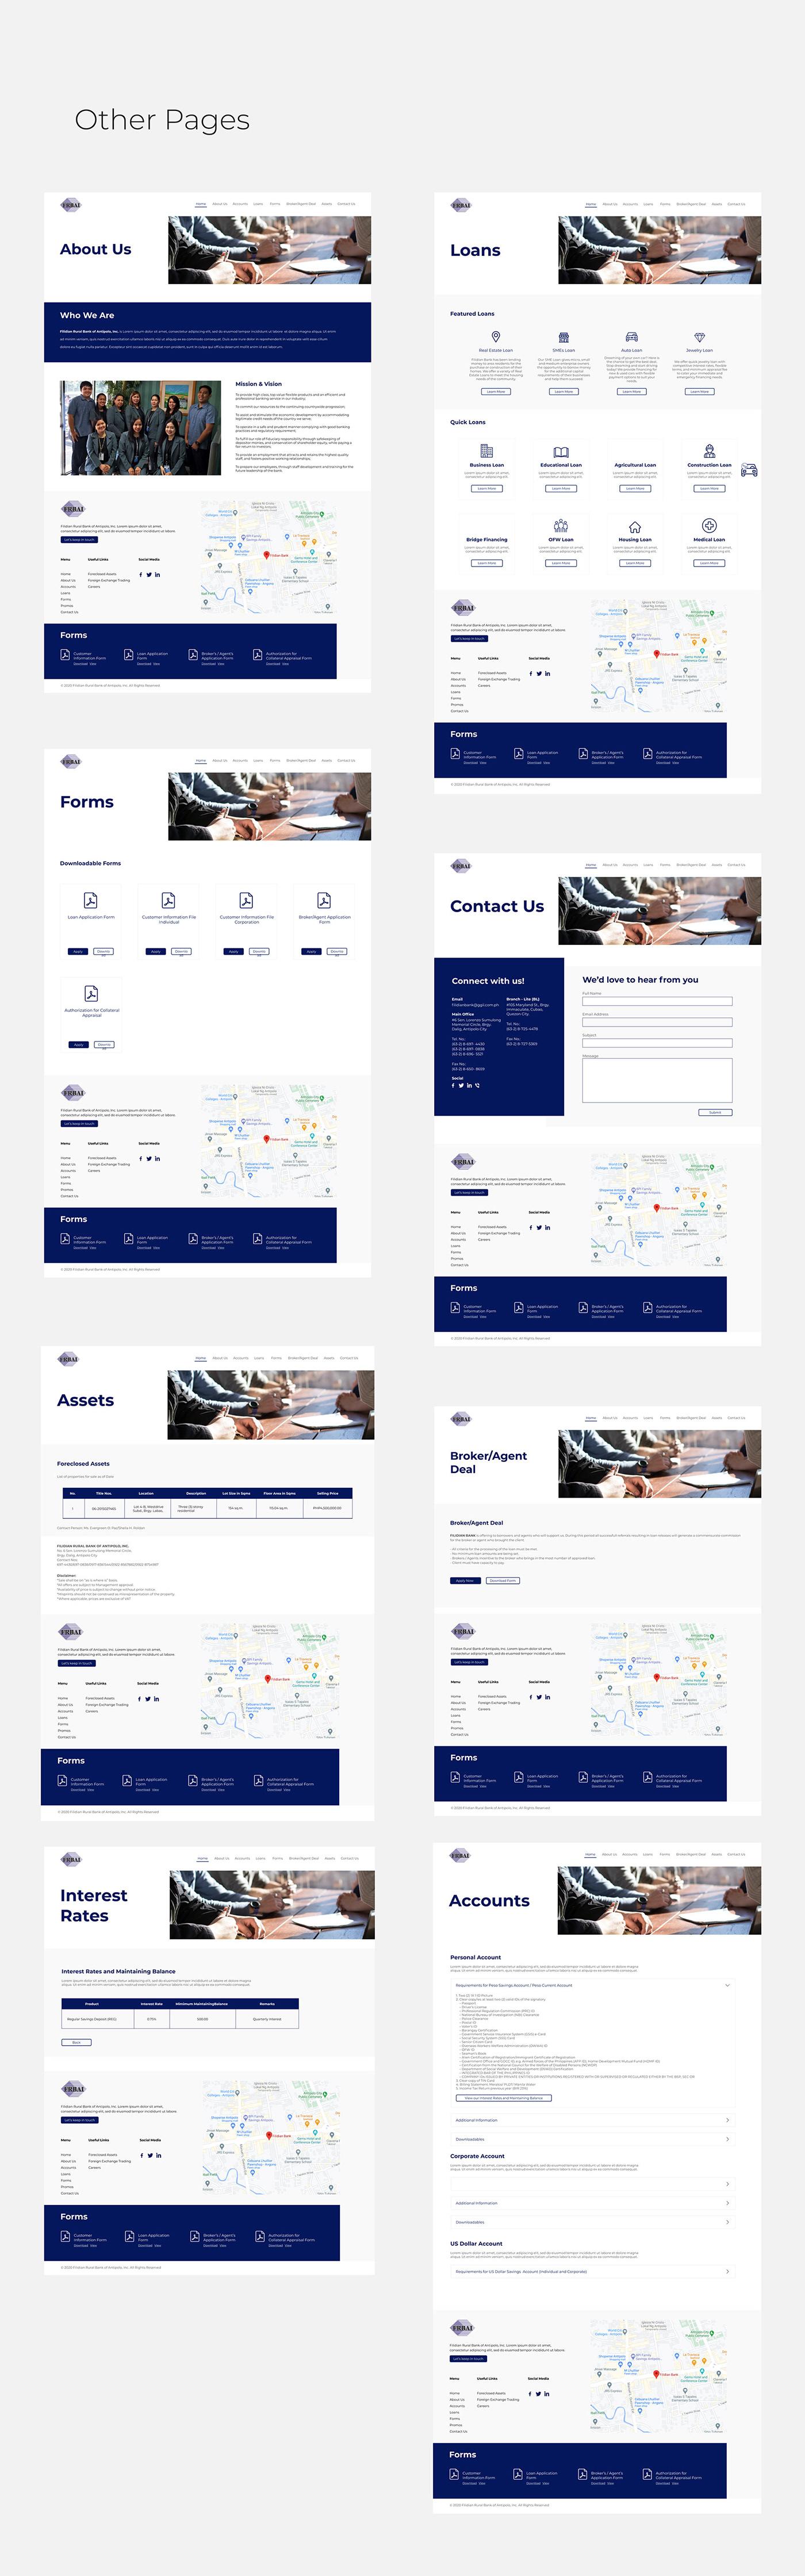 Adobe XD art san diego Bank crtved UI ux Website Design website development